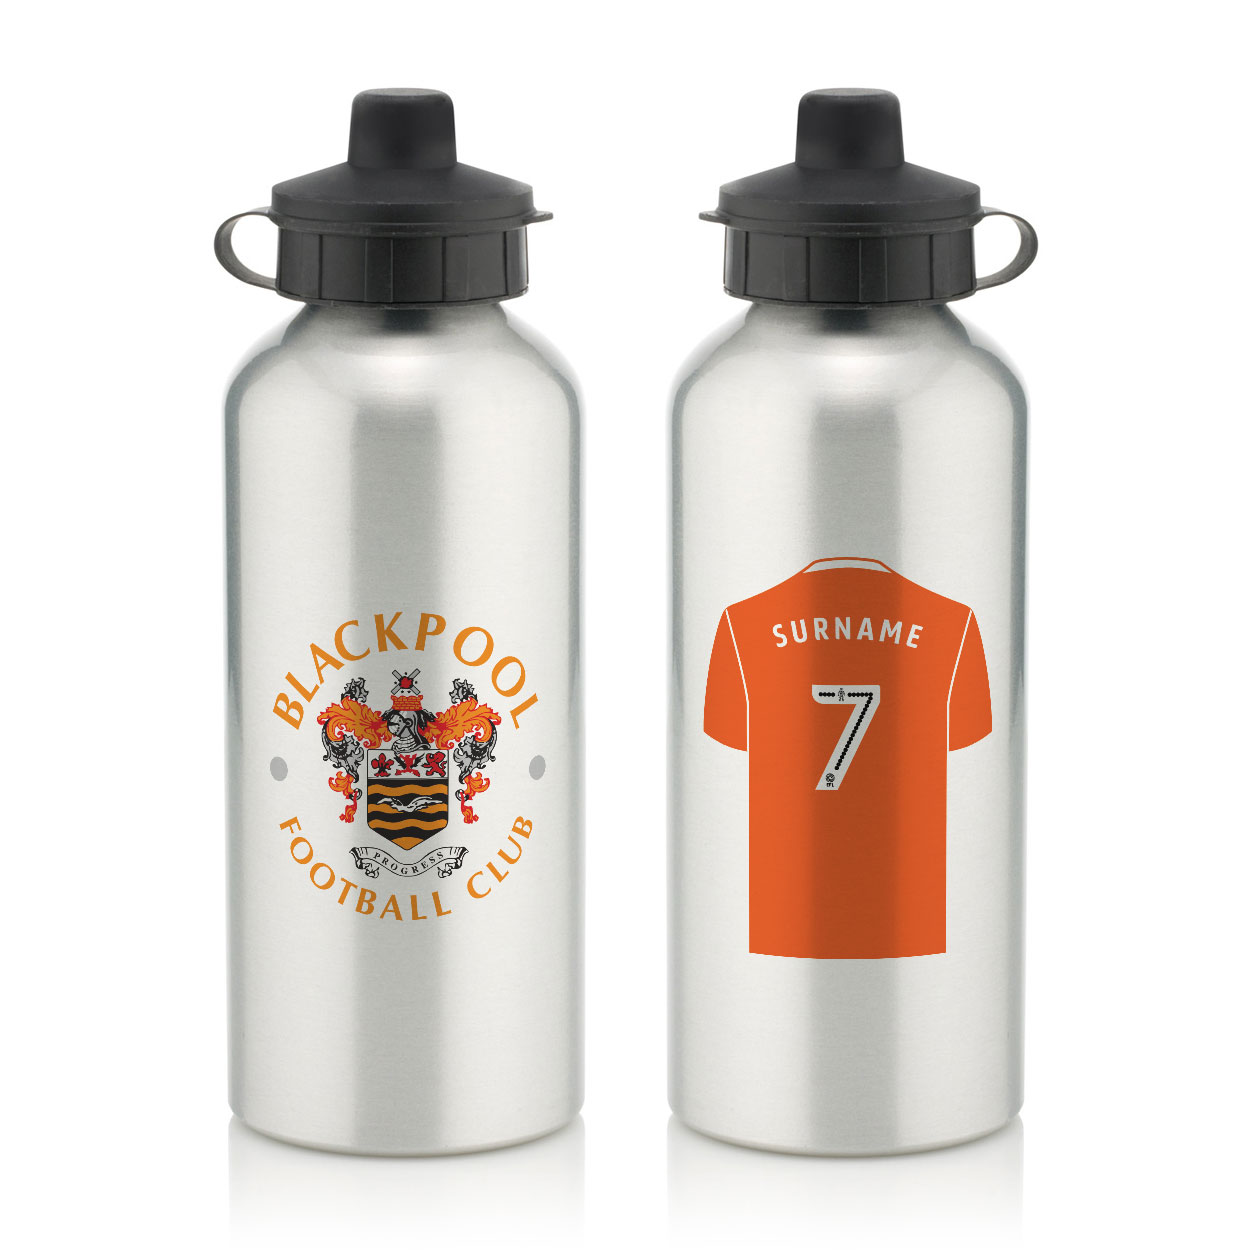 Blackpool FC Aluminium Water Bottle